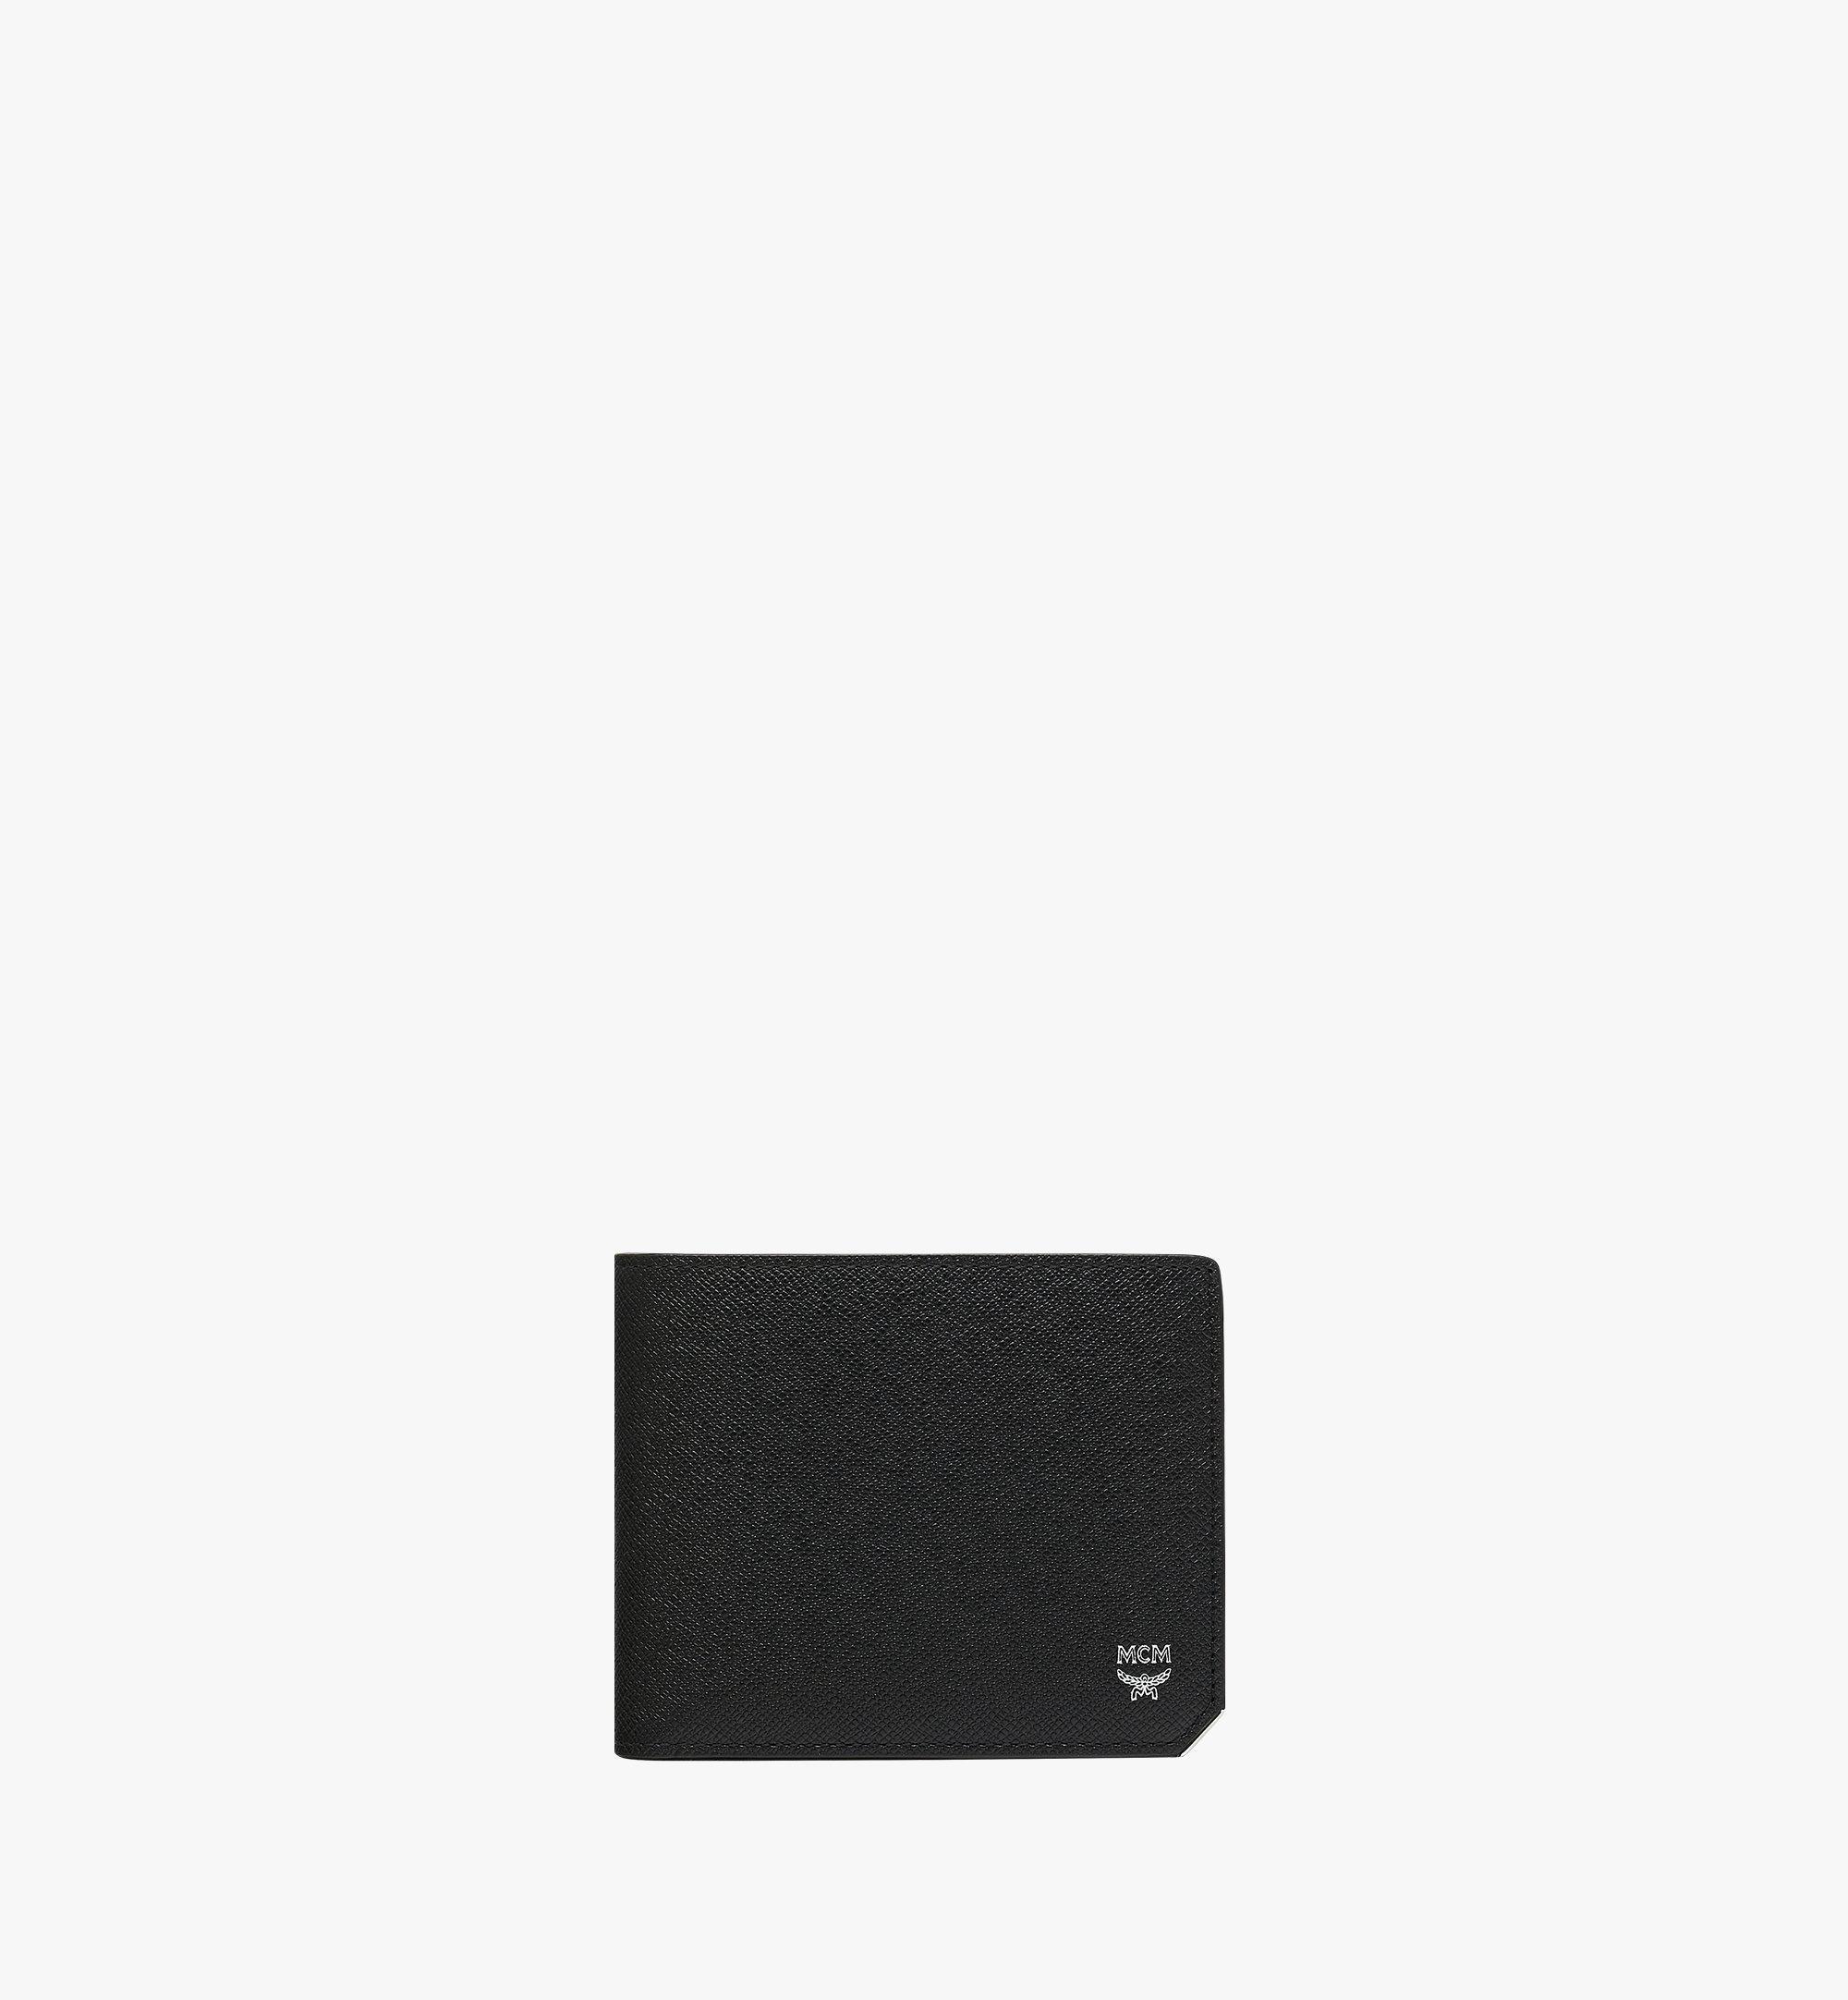 MCM 뉴브릭 엠보싱 레더 카드케이스 2단 지갑 Black MXS8ALL52BK001 Alternate View 1